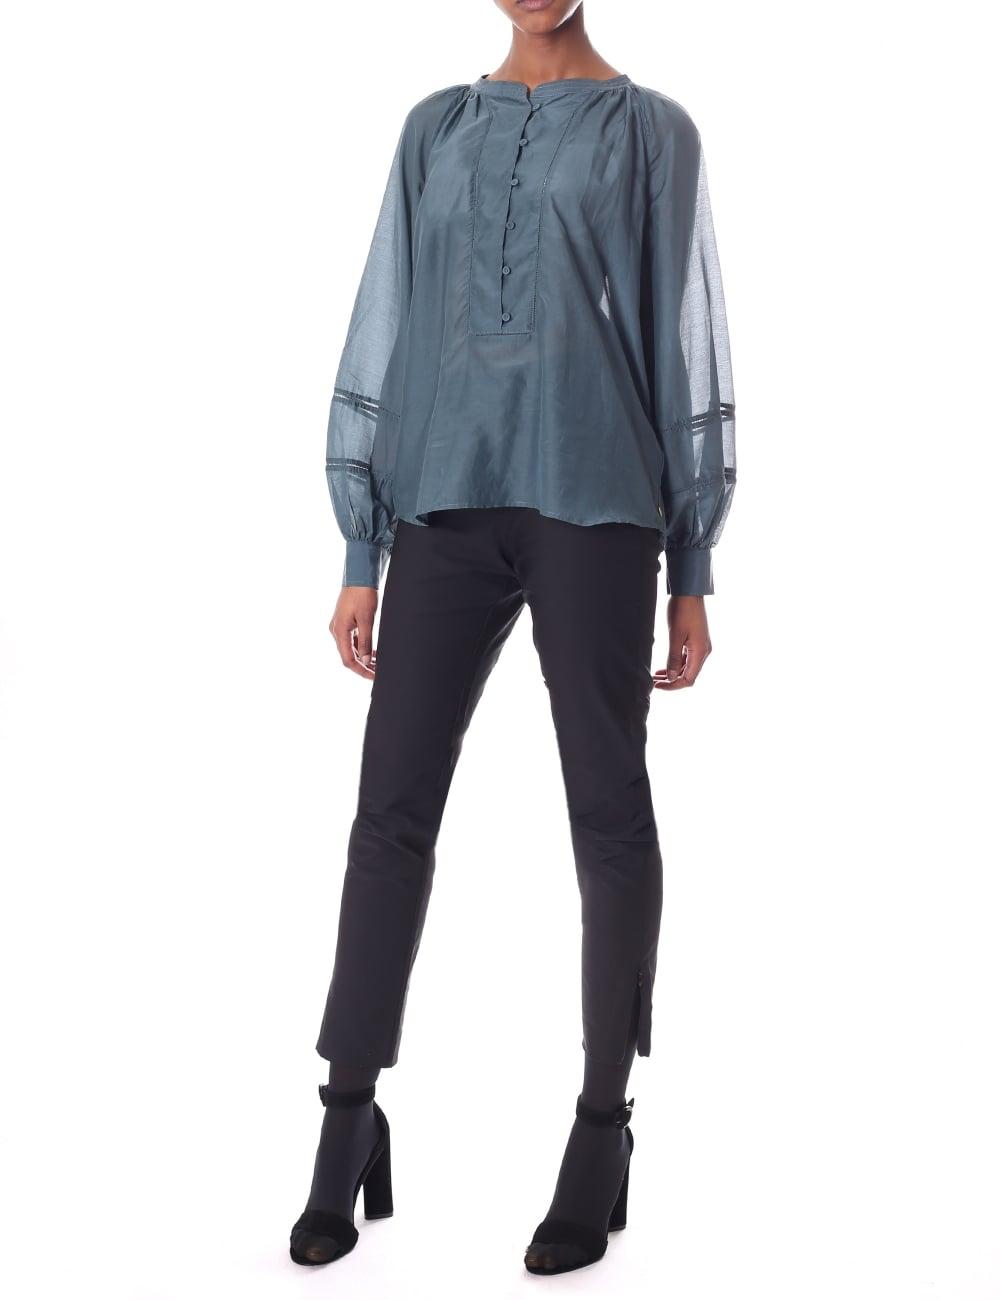 6b8aed3570a Maison Scotch Women's Cotton Silk Tunic Top